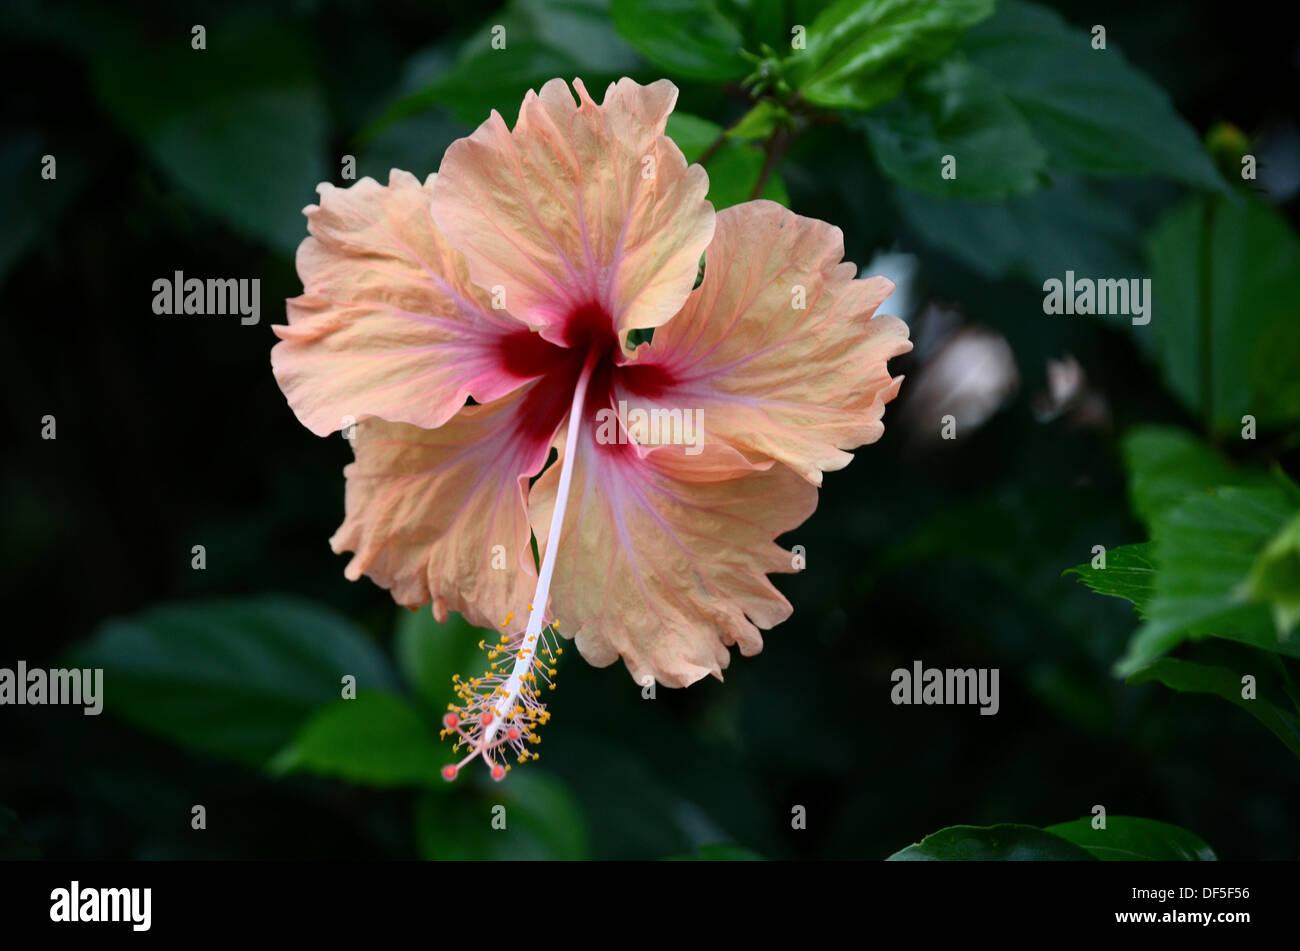 Purple hibiscus stock photos purple hibiscus stock images alamy peach and blood red purple hibiscus flower stock image izmirmasajfo